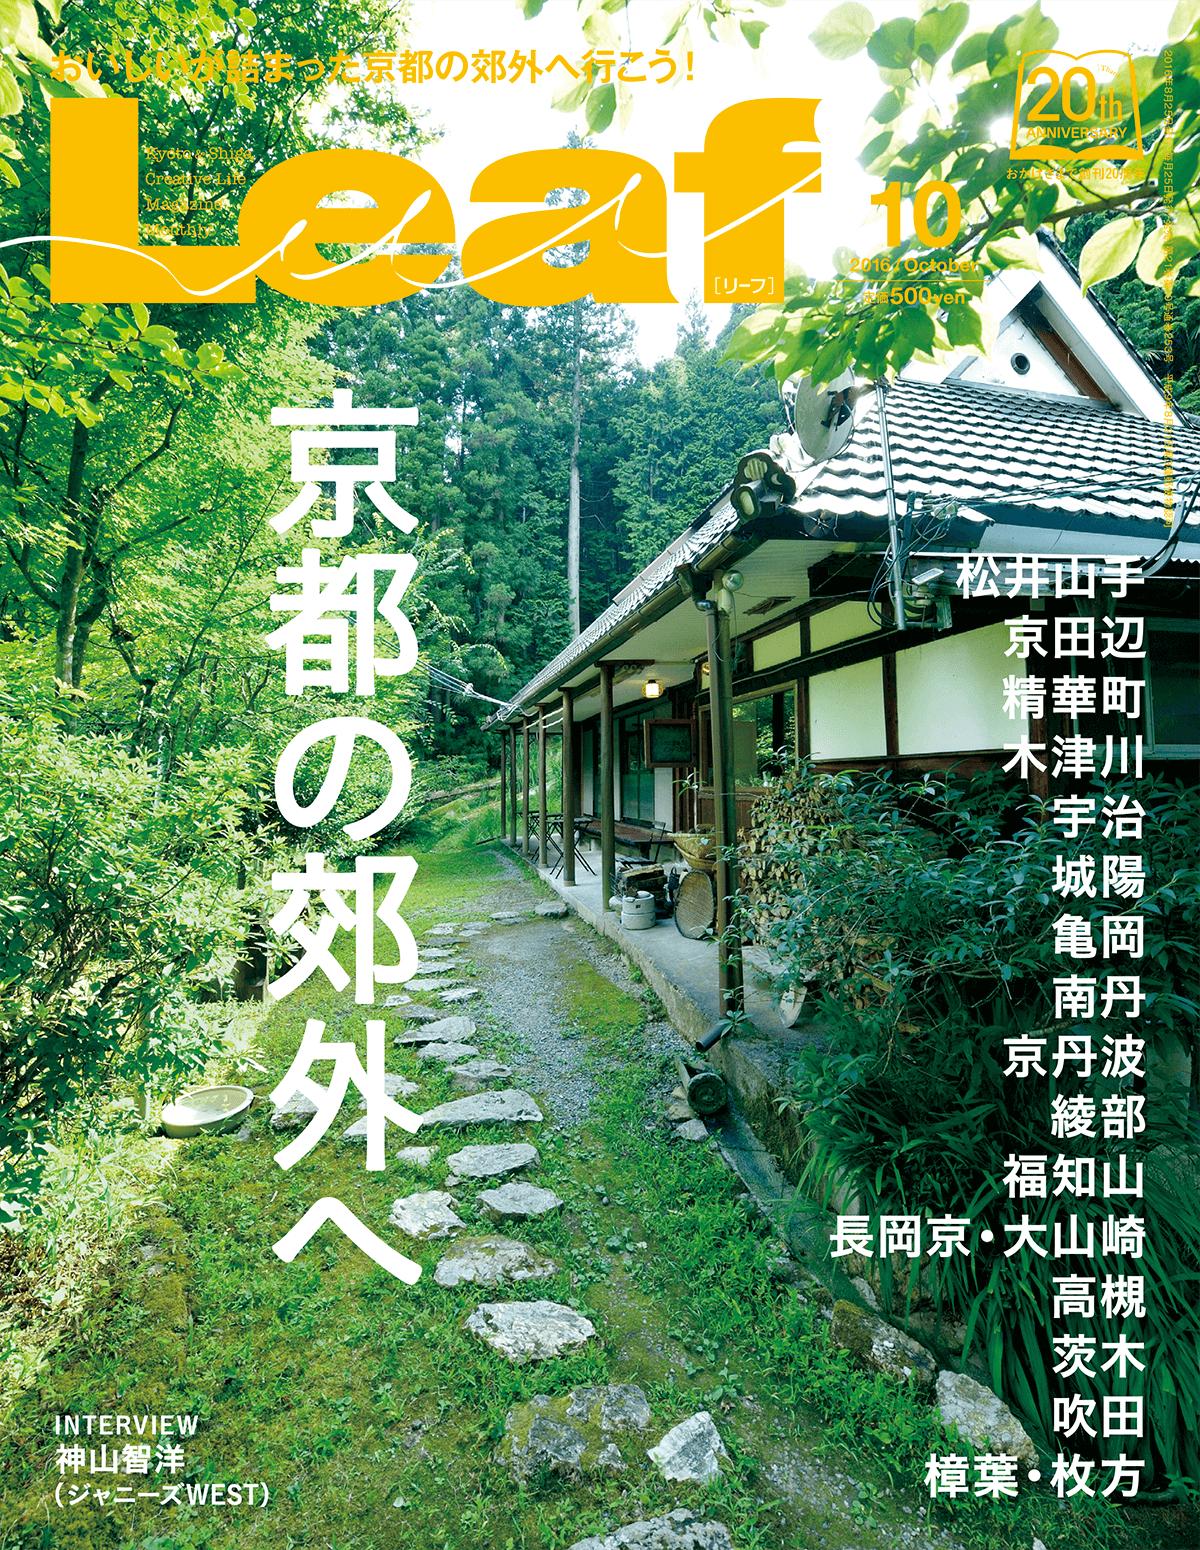 Leaf - 京都の郊外へ!